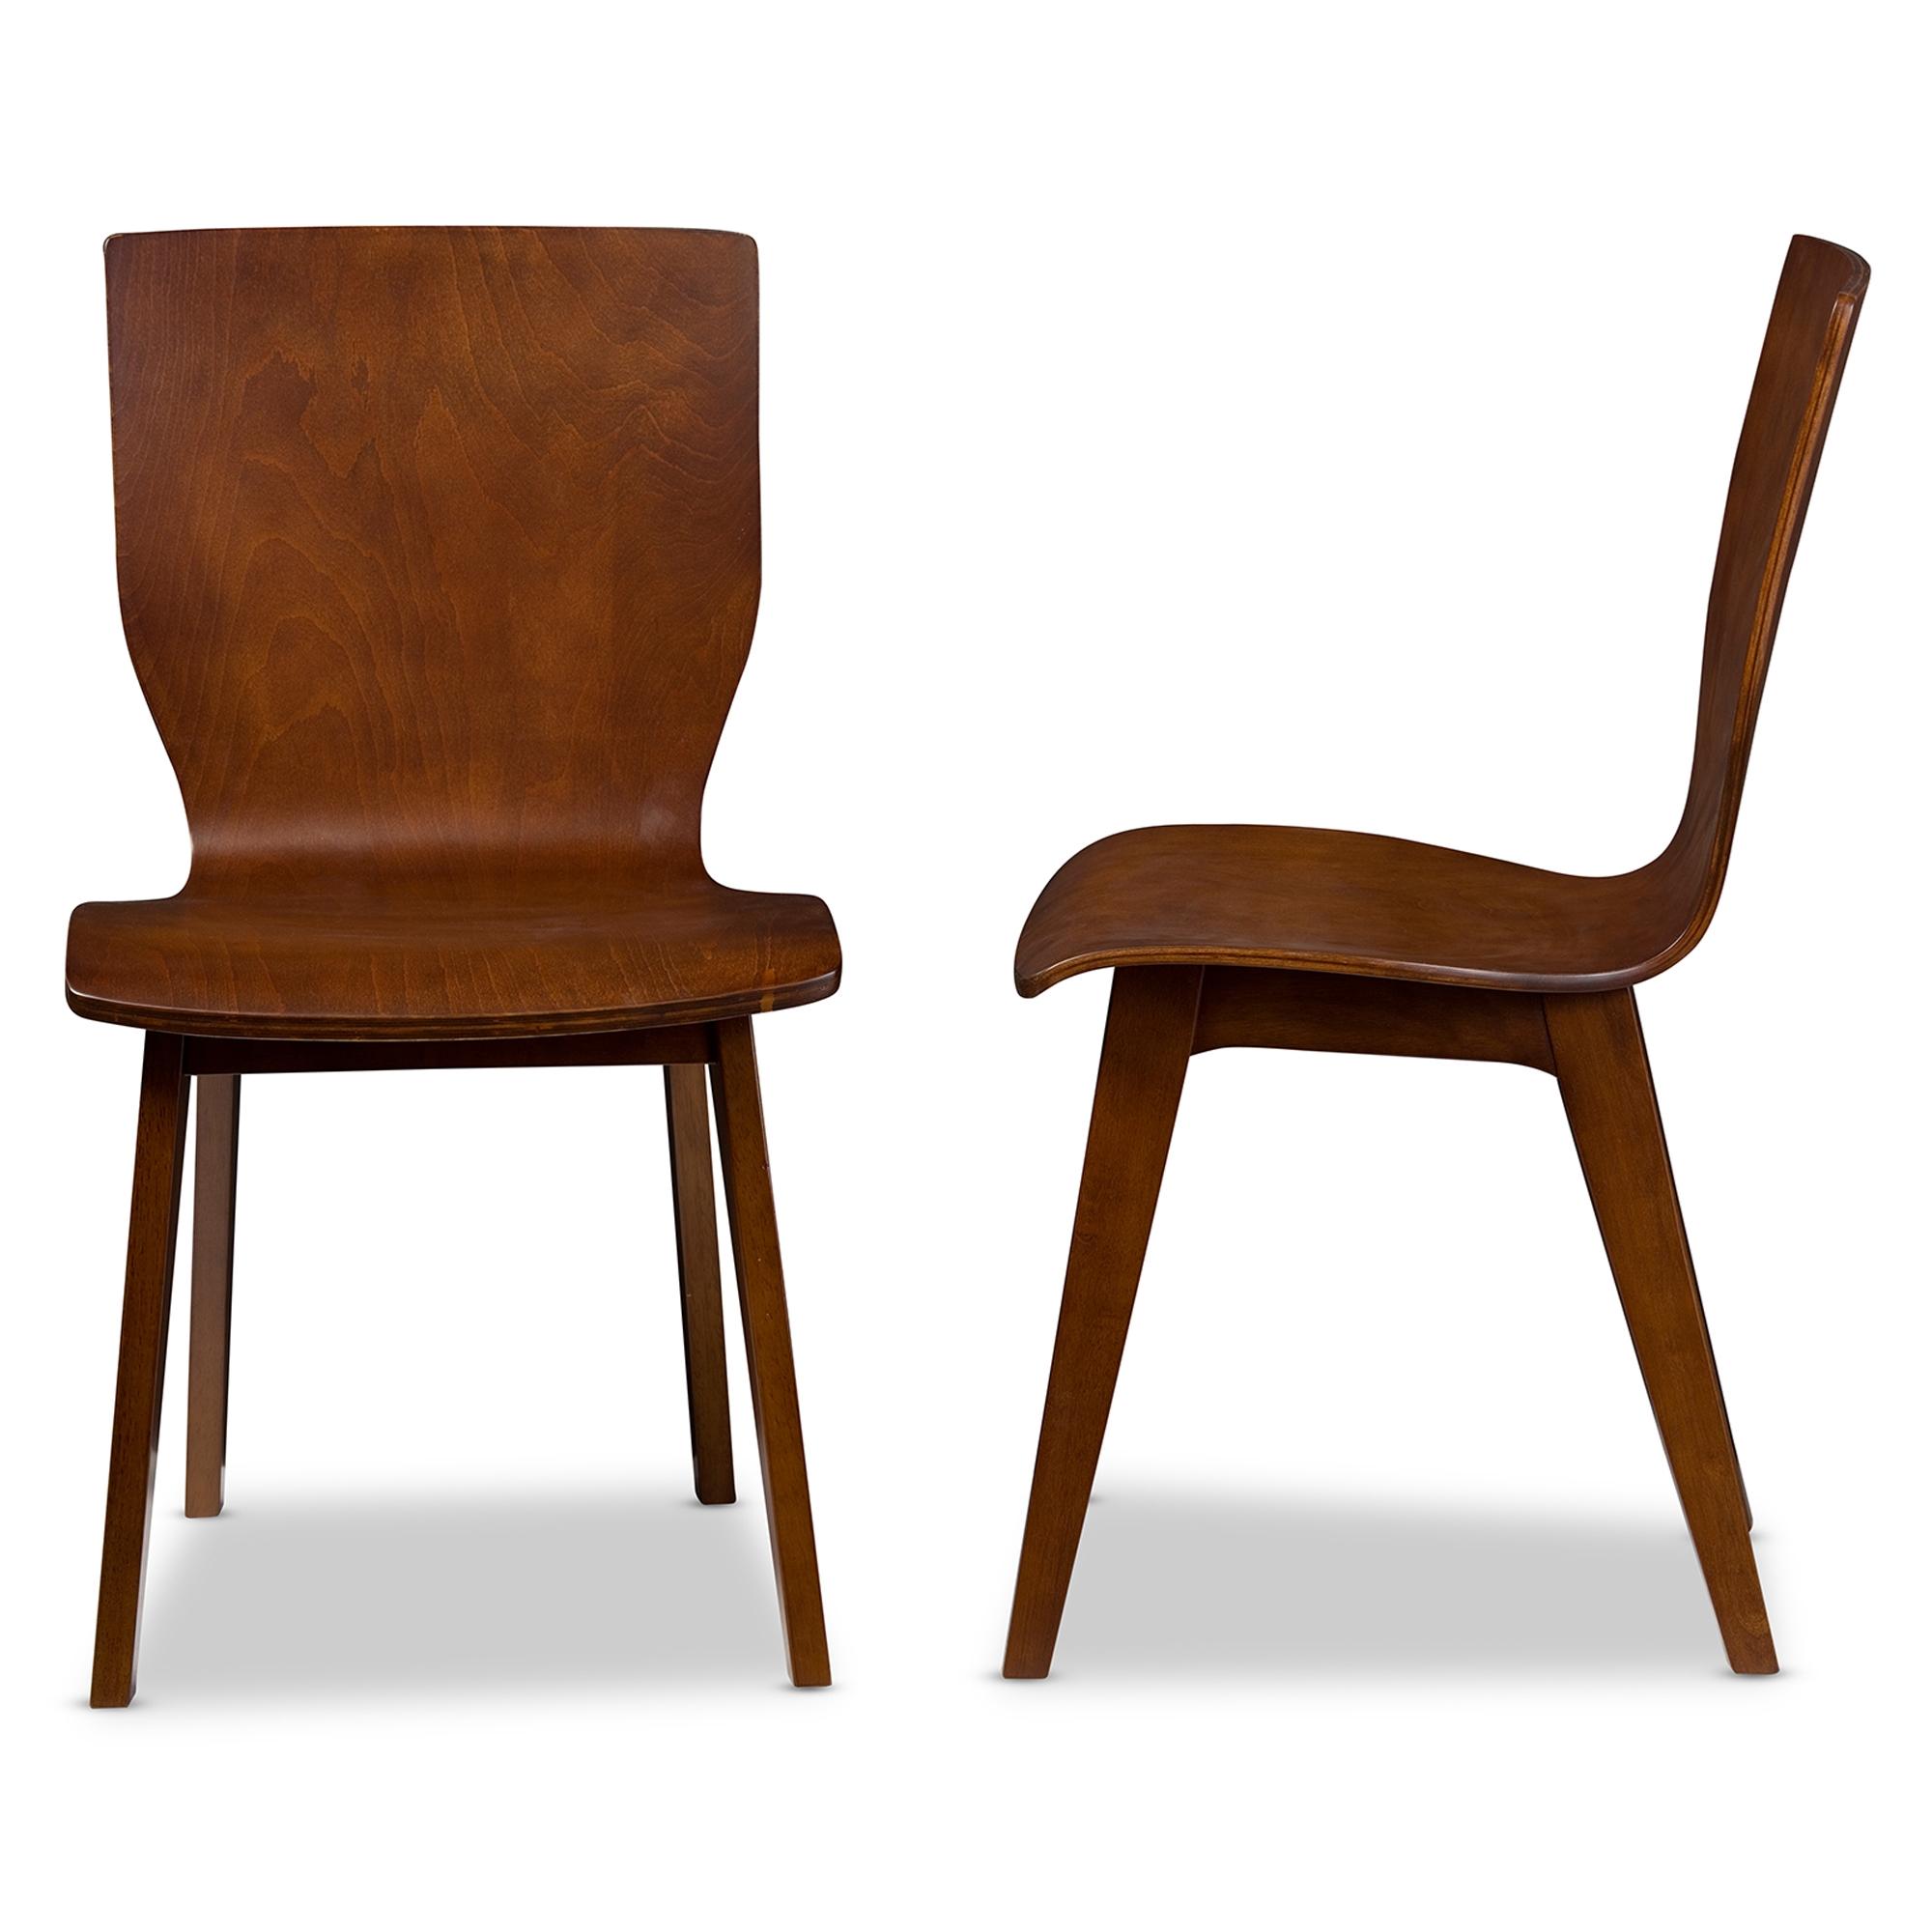 Baxton studio elsa mid century modern scandinavian style for Dining chairs dark wood